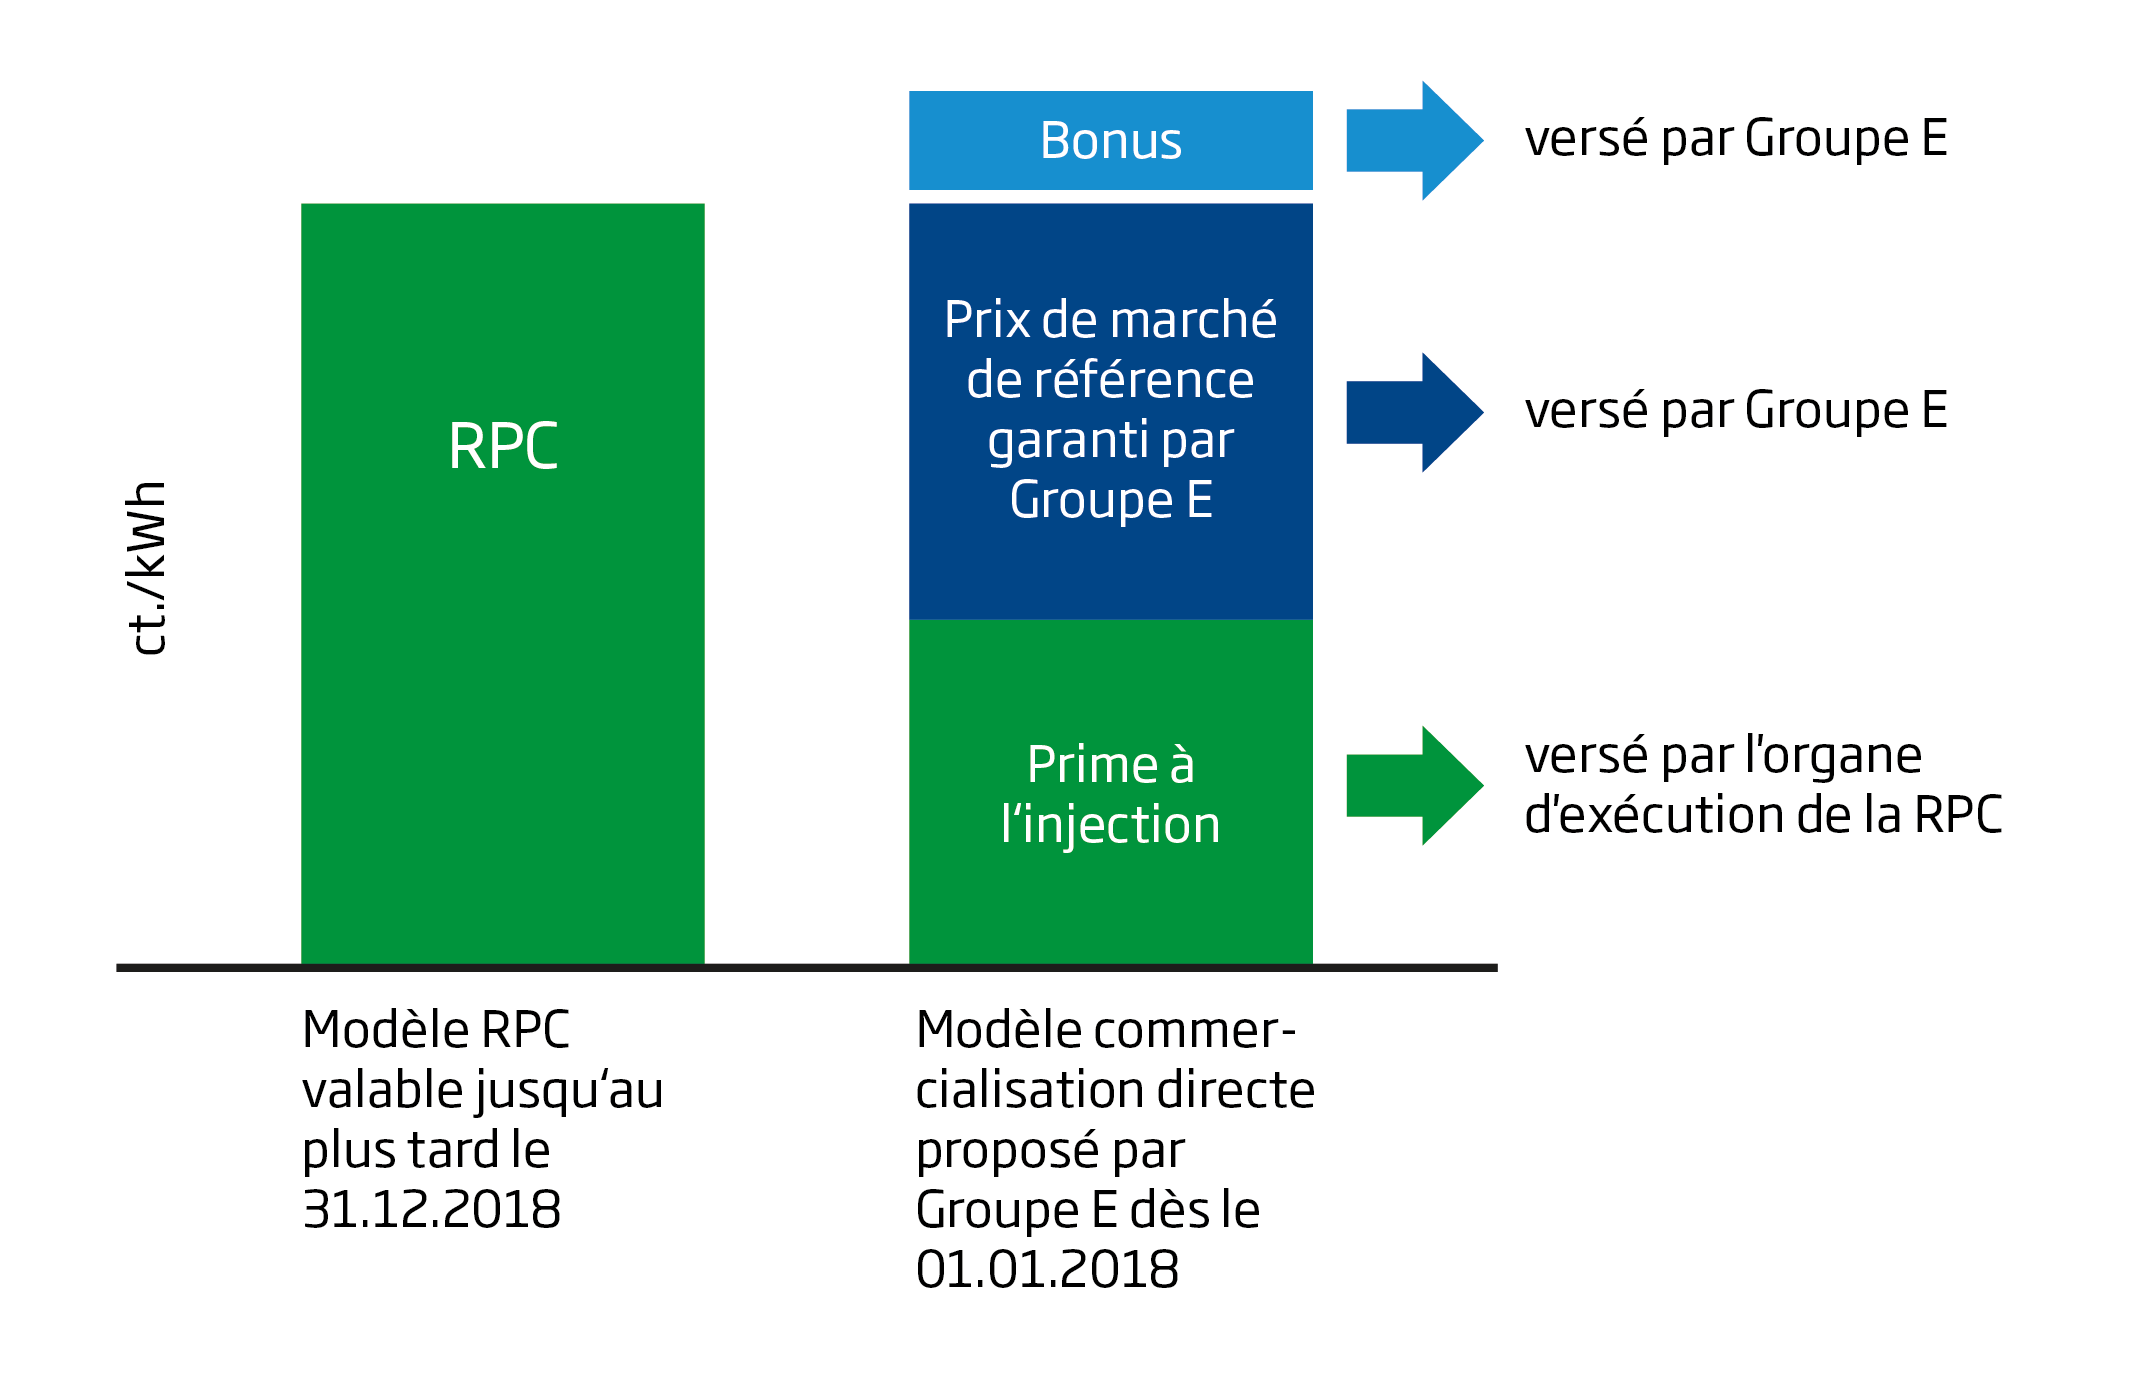 modèle RPC